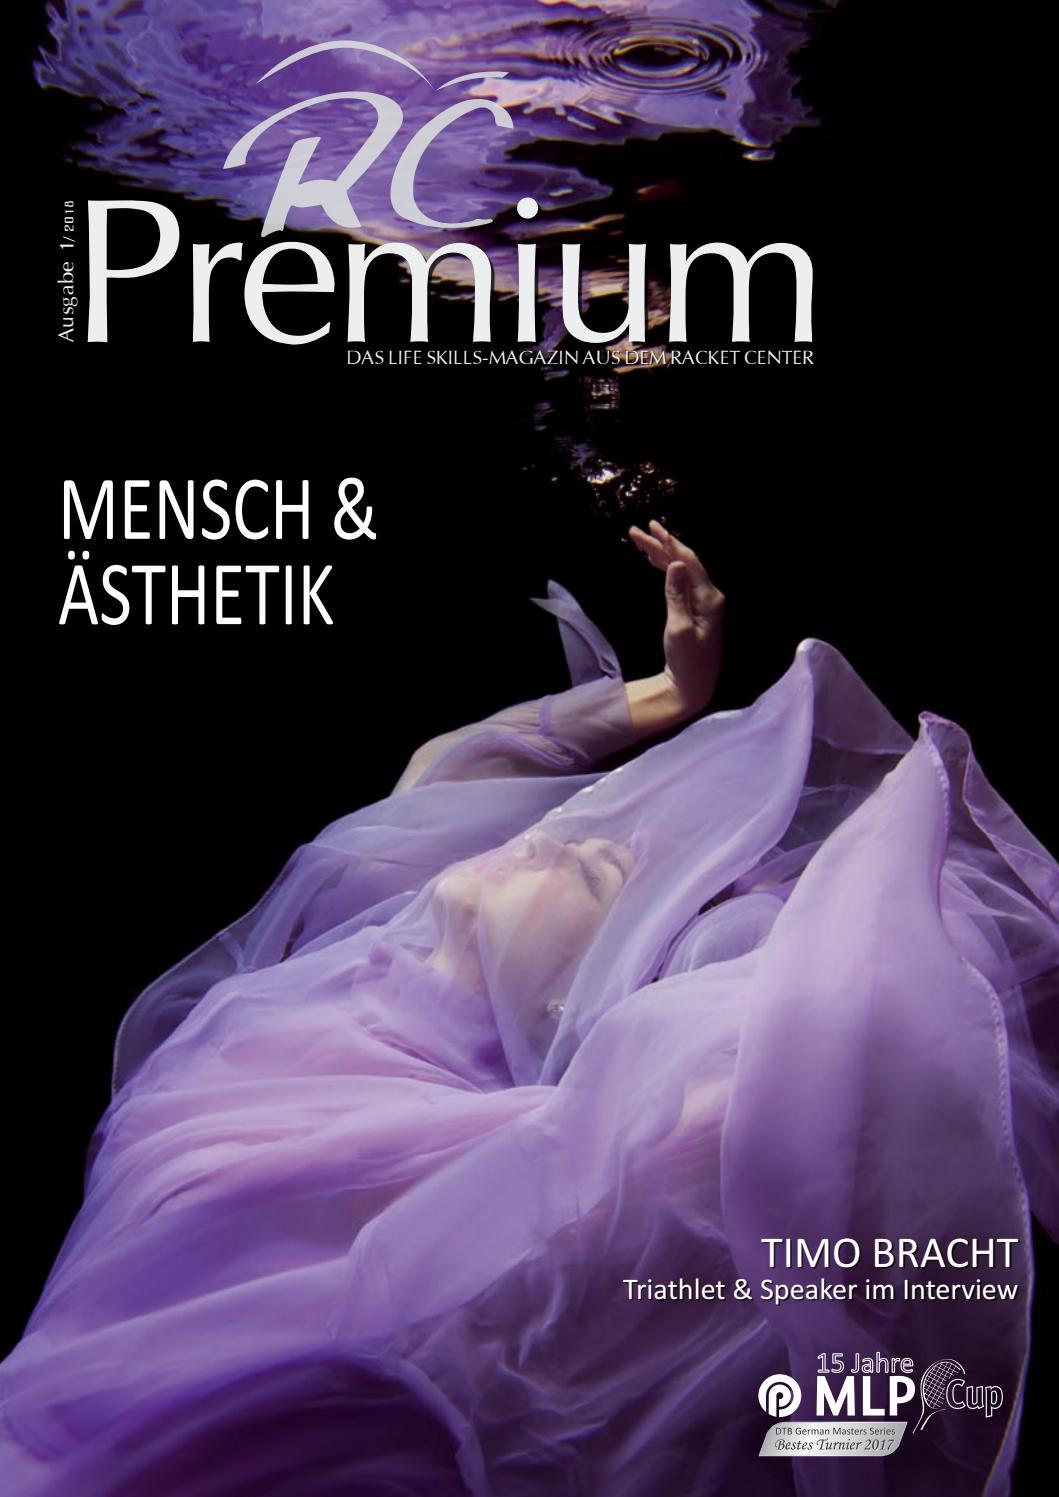 RC Premium 1/2018 by GSM mbH - issuu